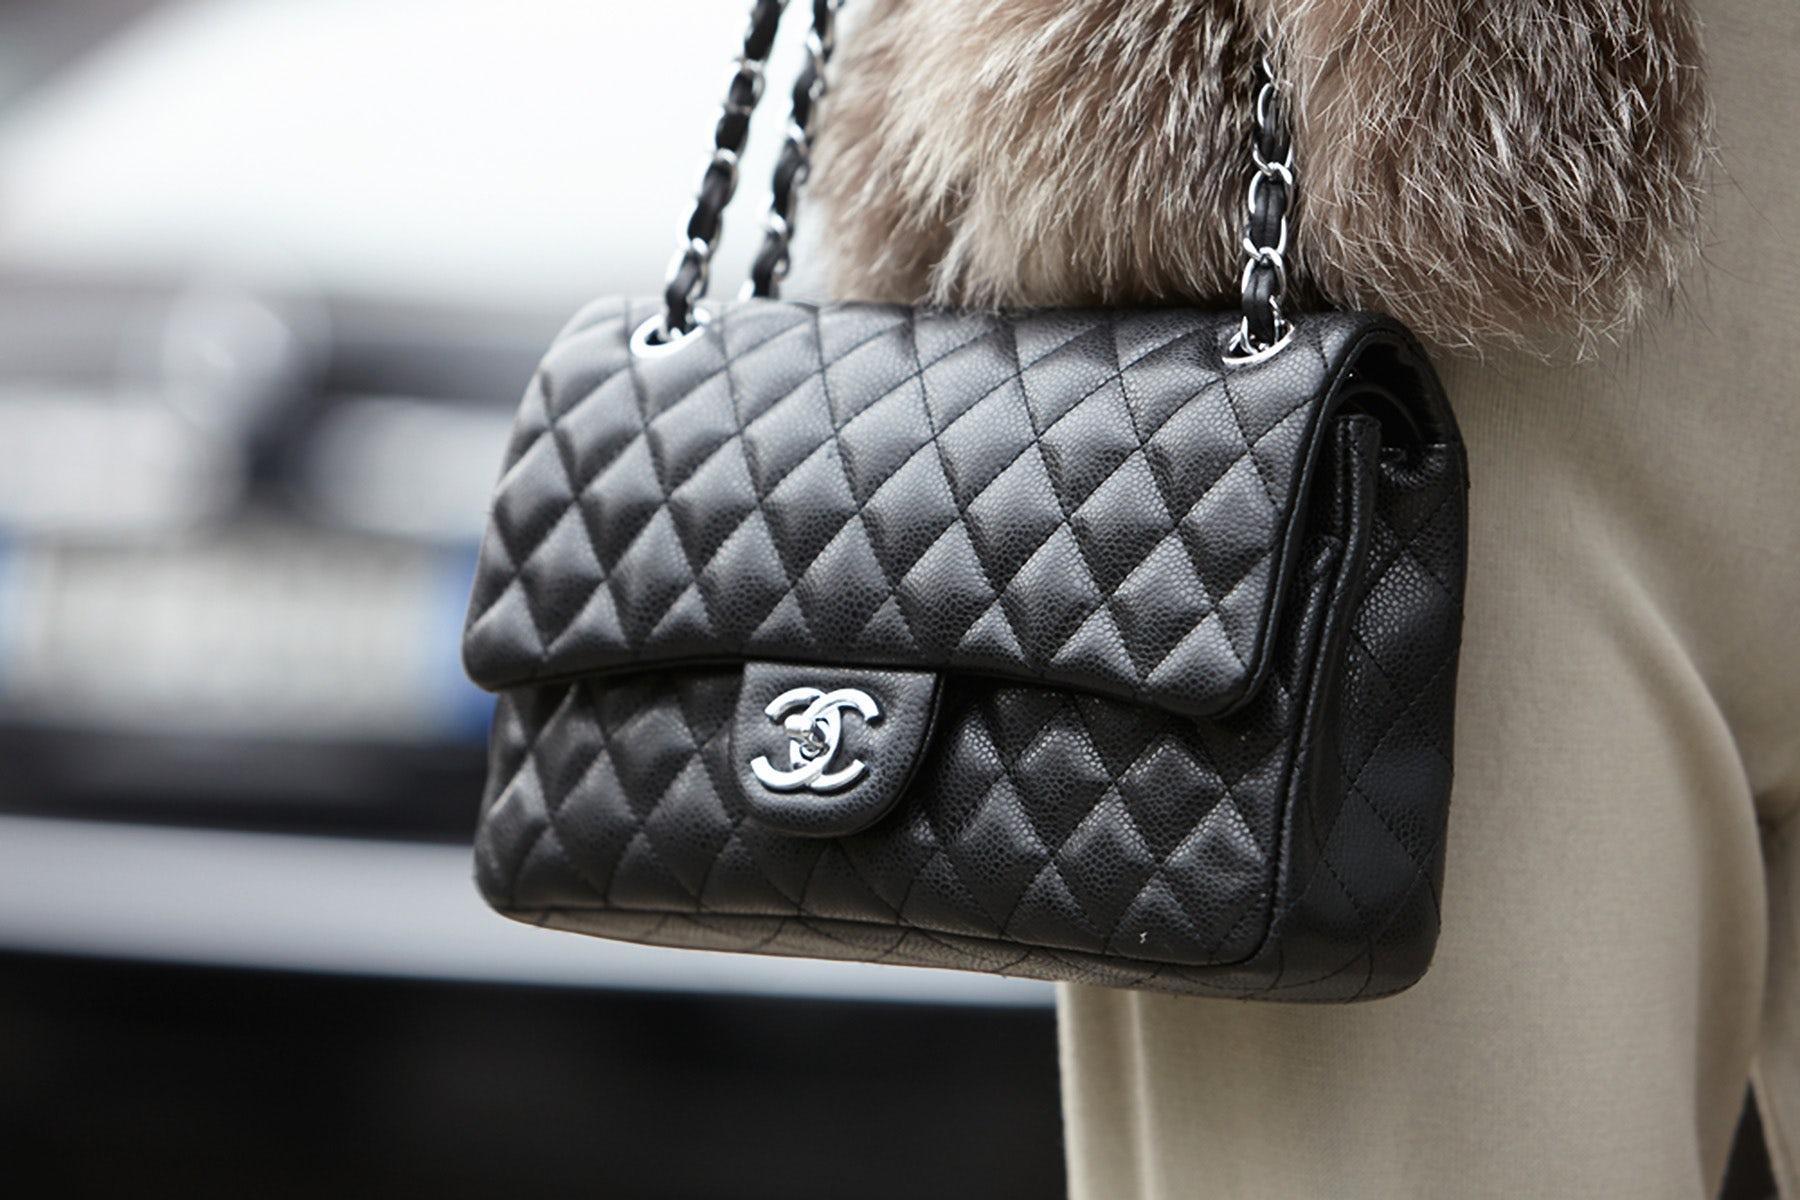 Chanel handbag   Source: Shutterstock